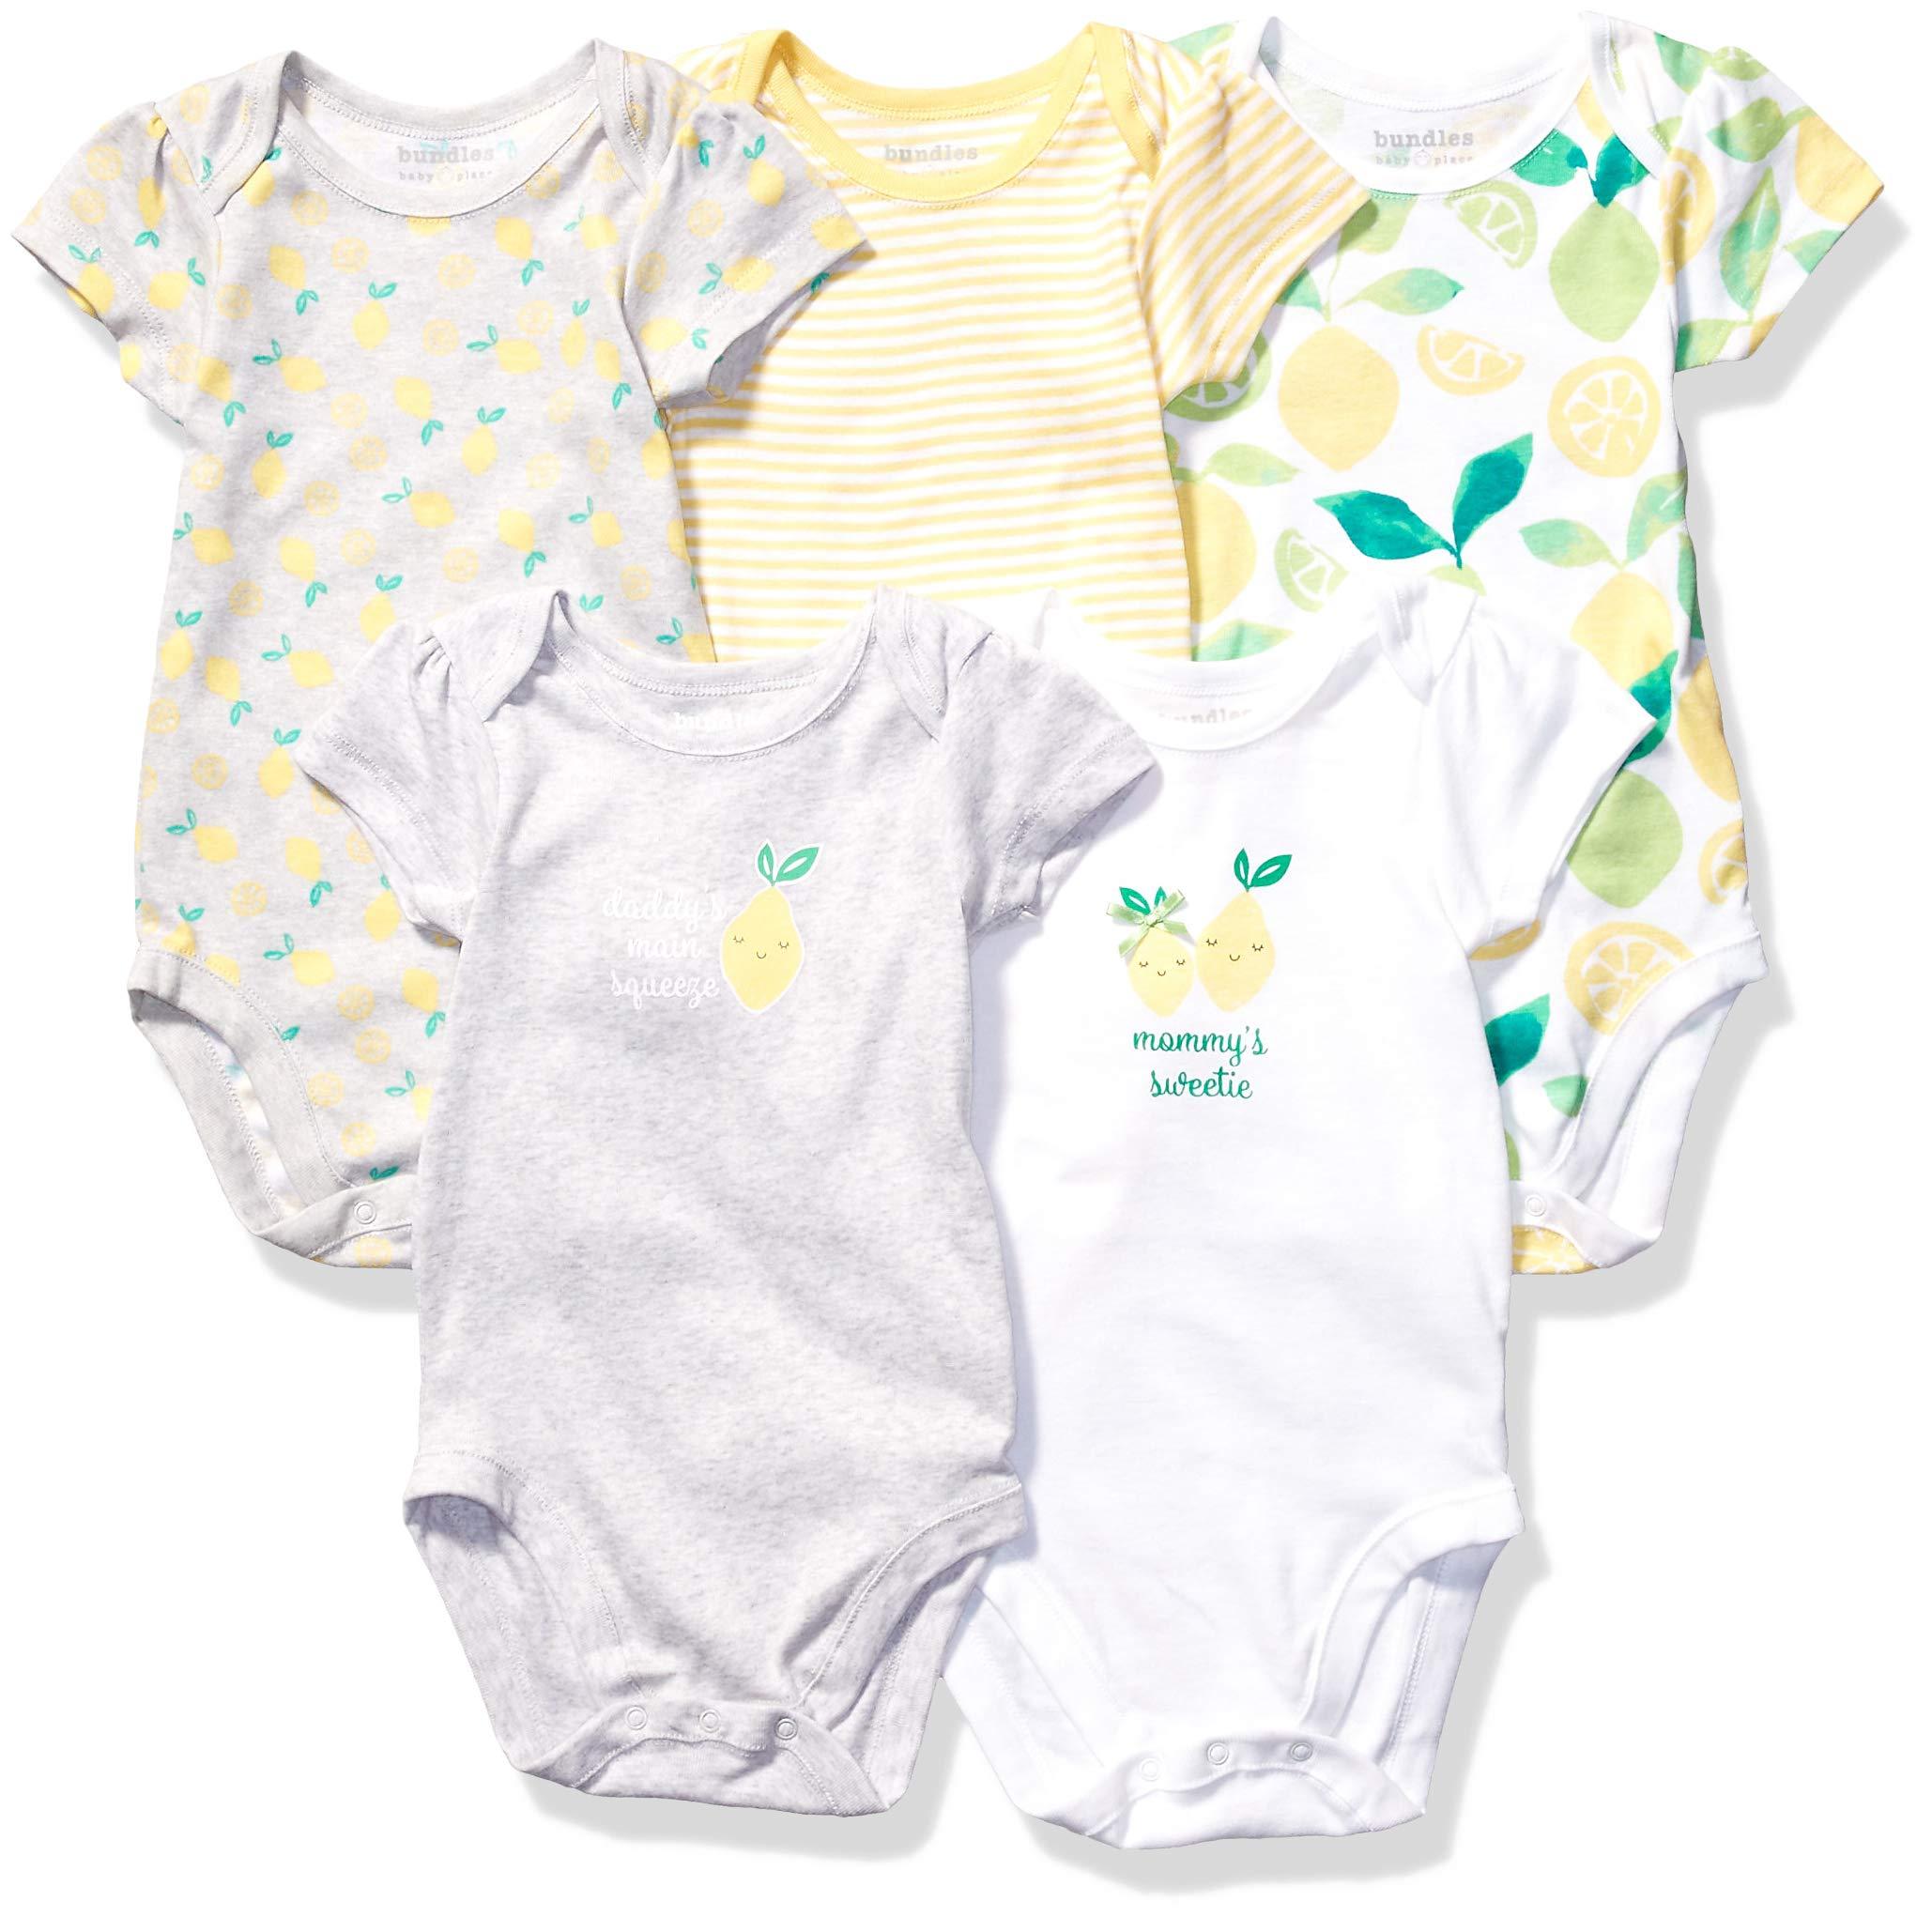 The Children's Place Baby Girls Short Sleeve Bodysuit (Pack of 5)